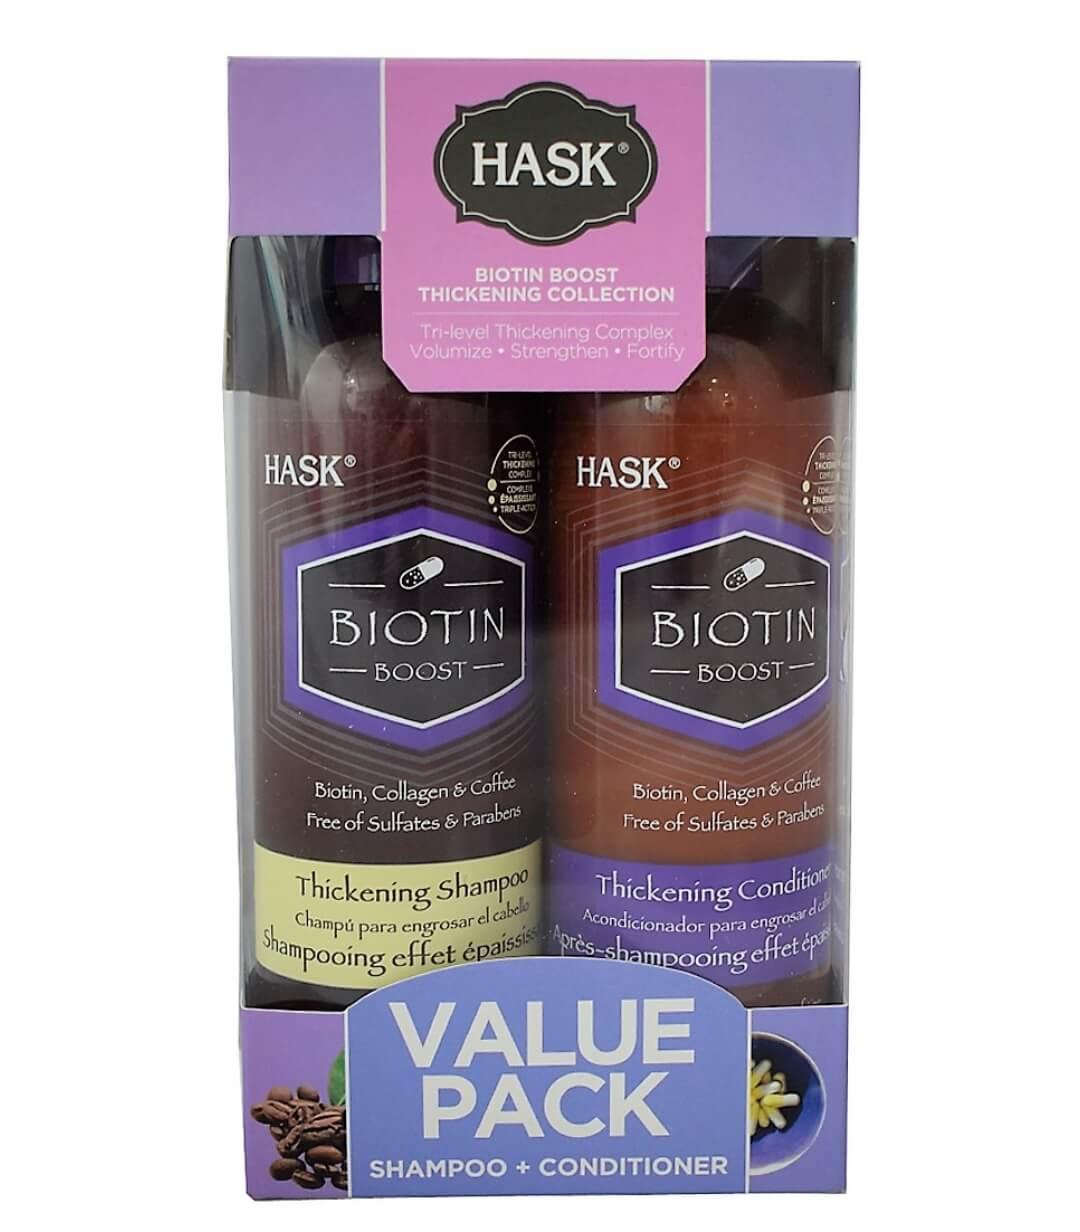 Hask Biotin Shampoo 355ml & Conditioner 355ml Value Pack